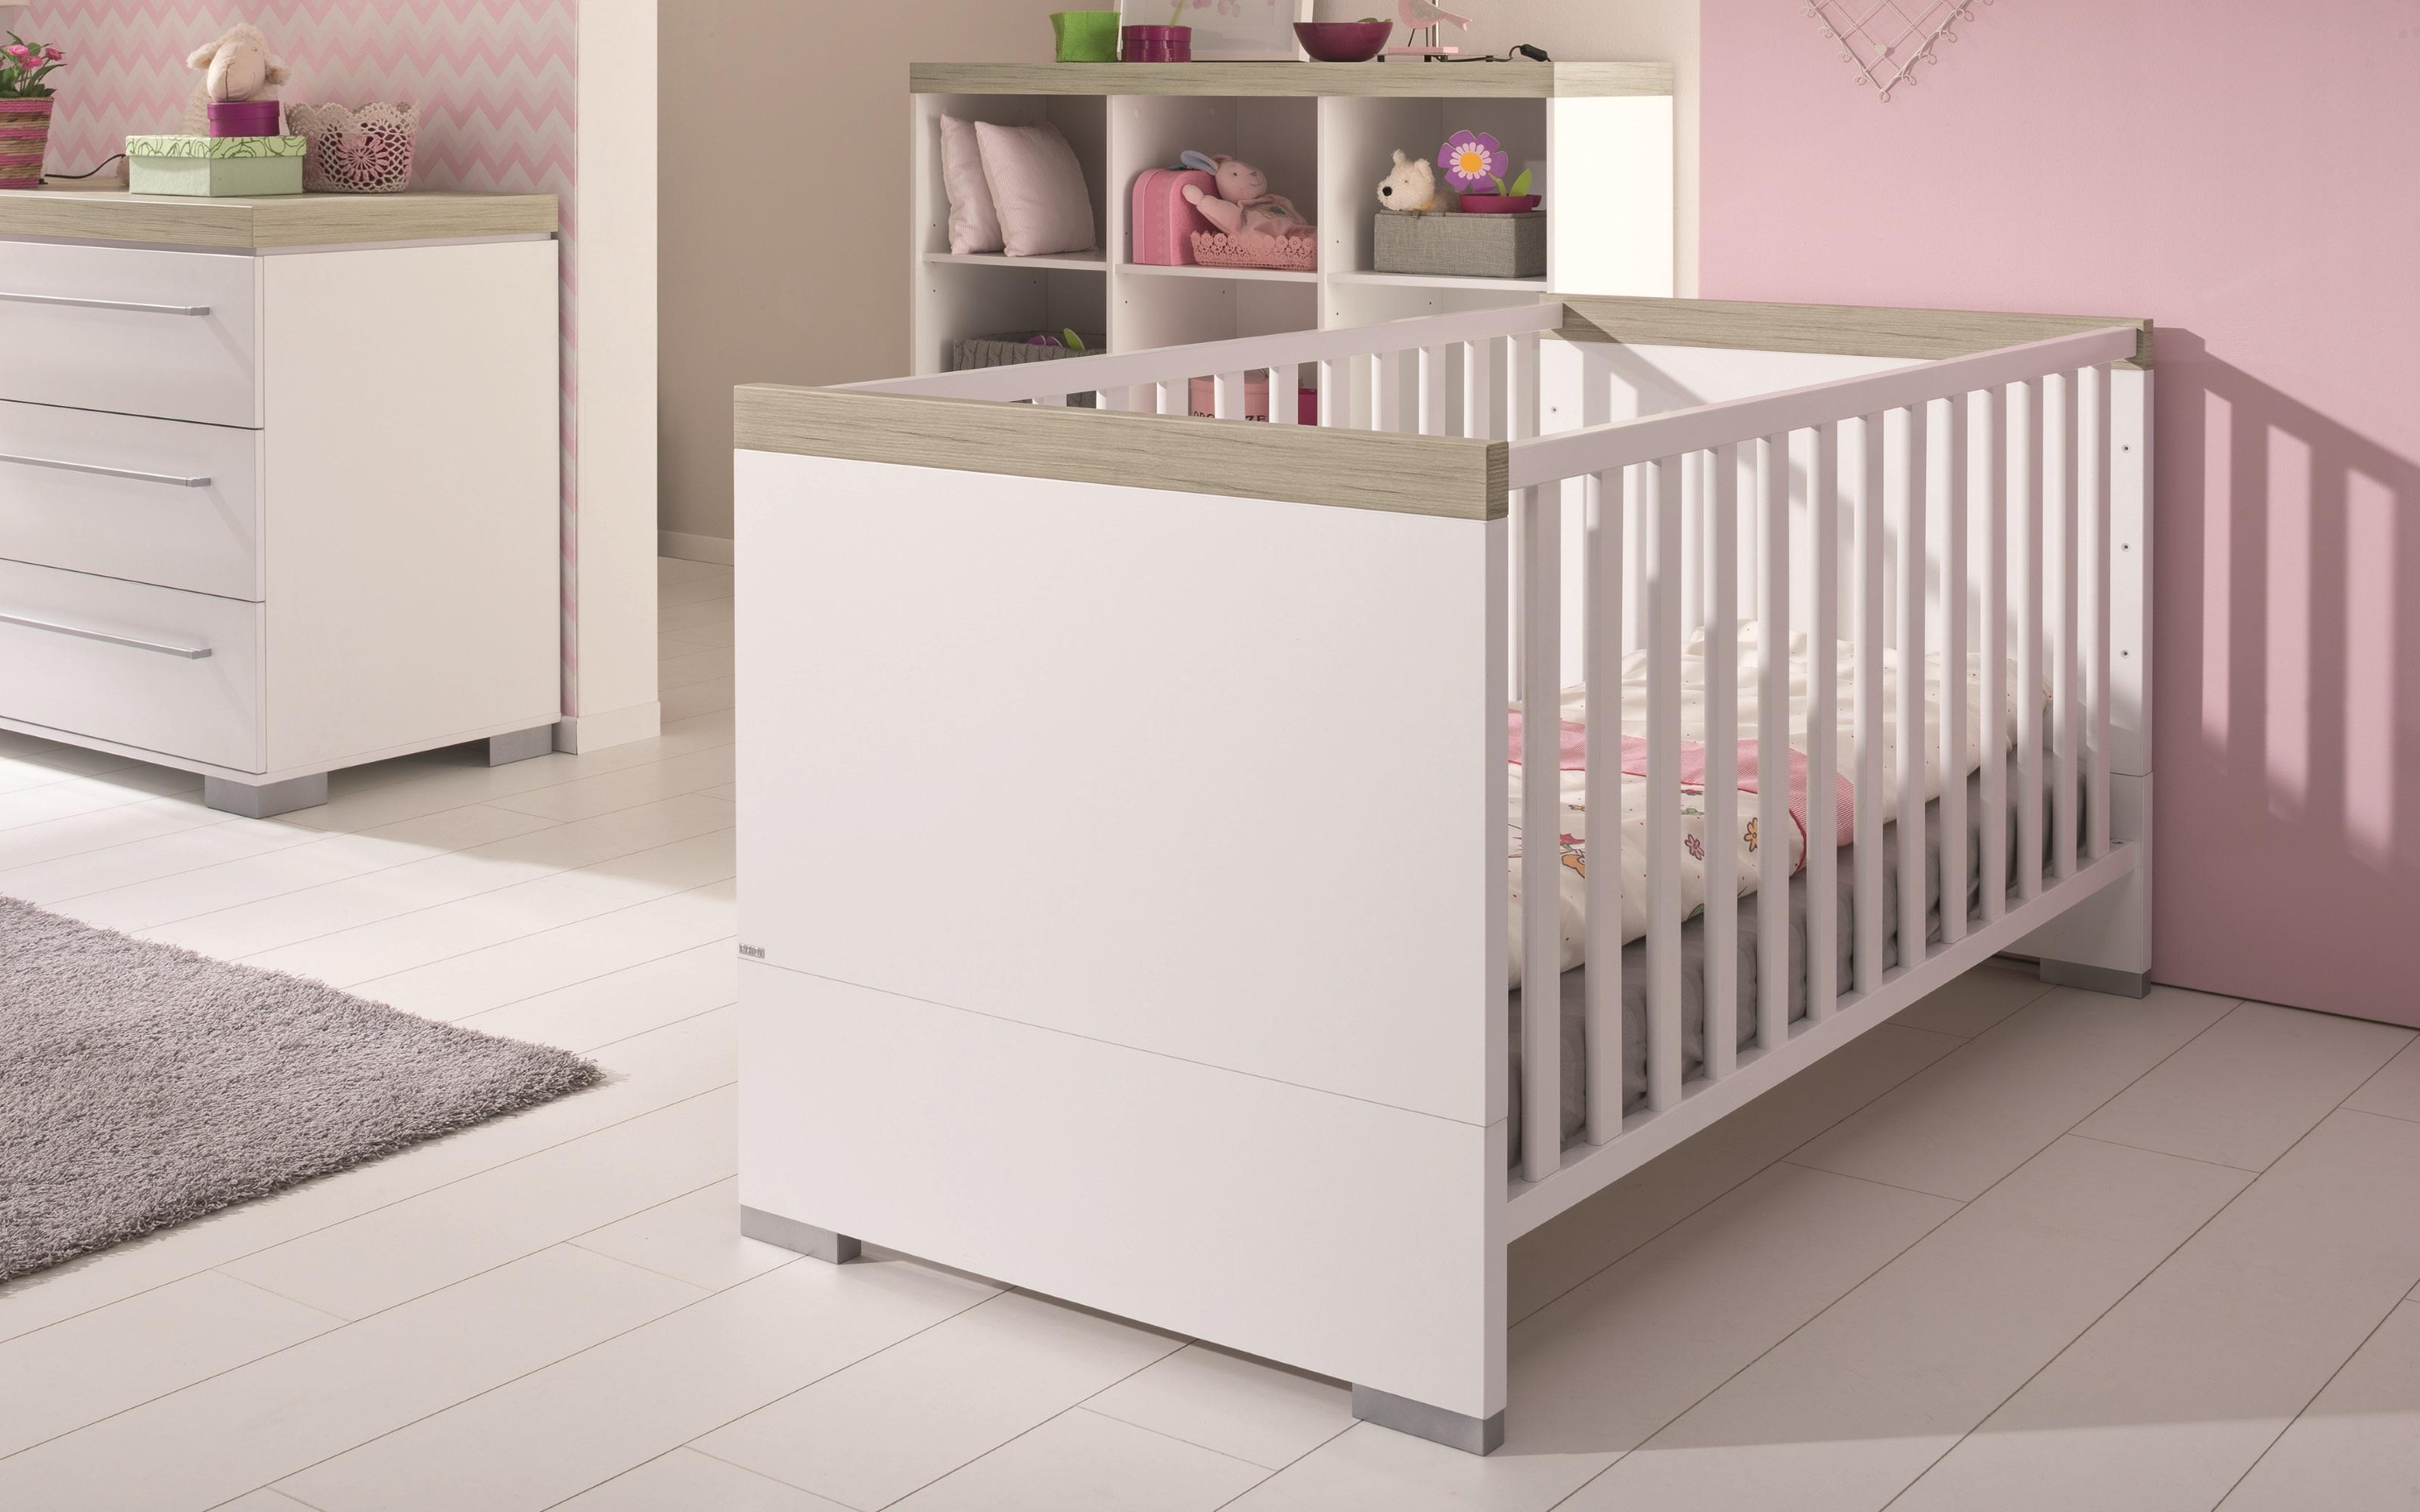 Kinderbett Kira in kreideweiß/Eiche-Nautik-Nachbildung